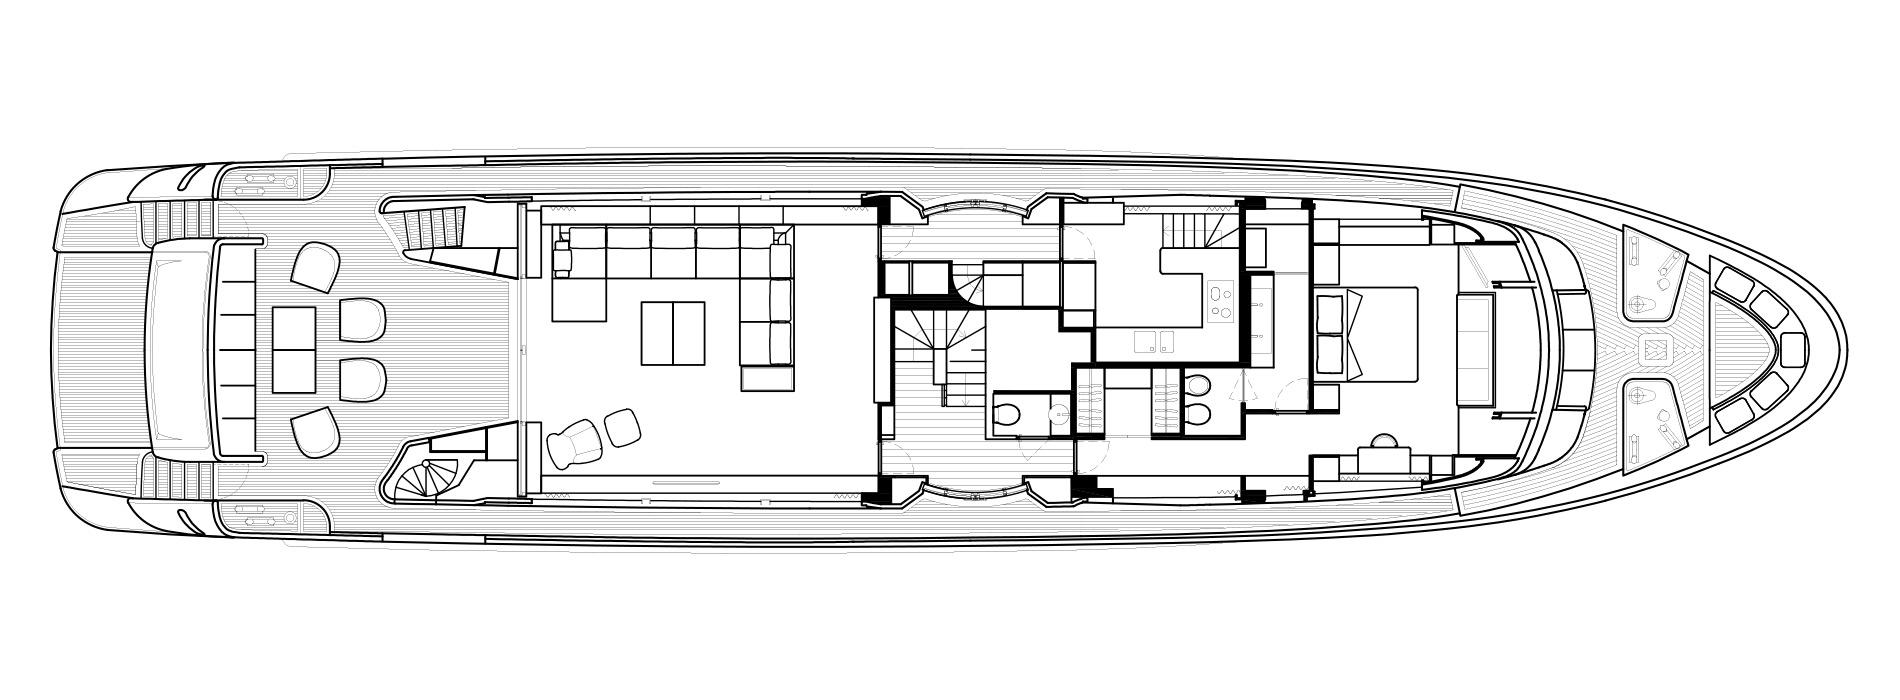 Sanlorenzo Yachts SD112 Main deck Versione B